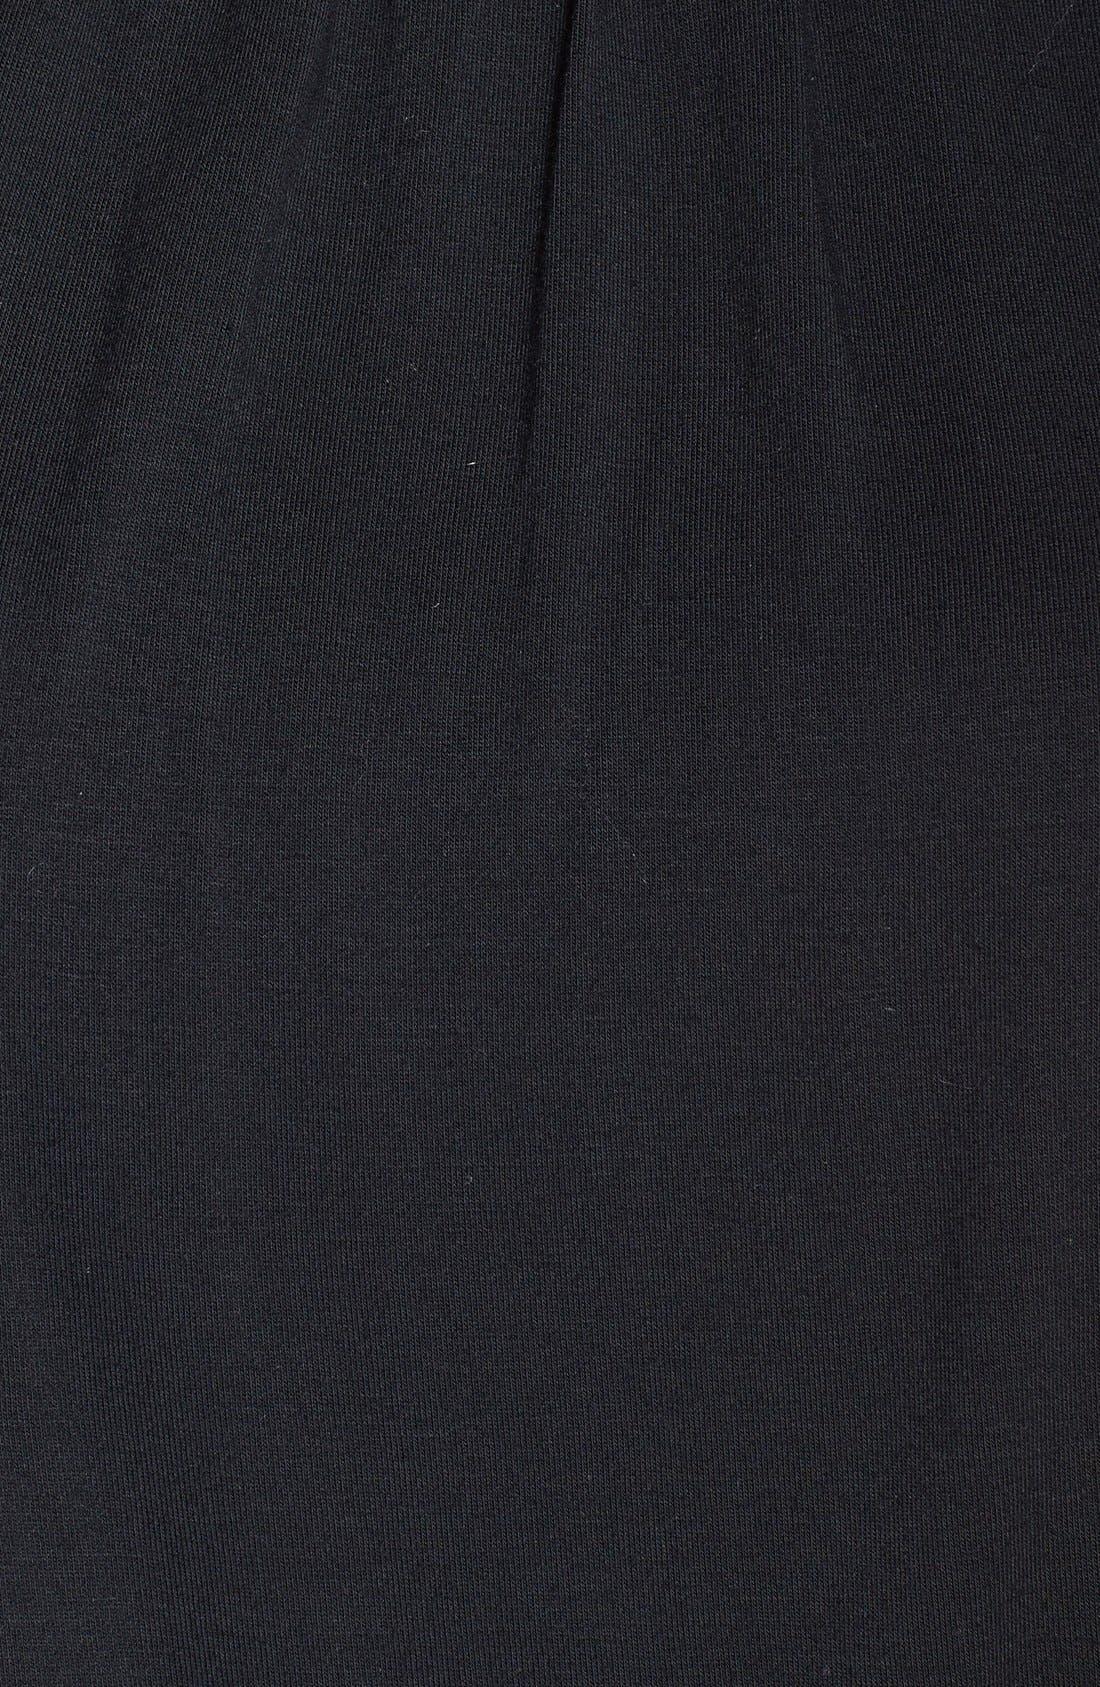 Alternate Image 4  - Felicity & Coco 'Vienna' Blouson Maxi Dress (Nordstrom Exclusive)